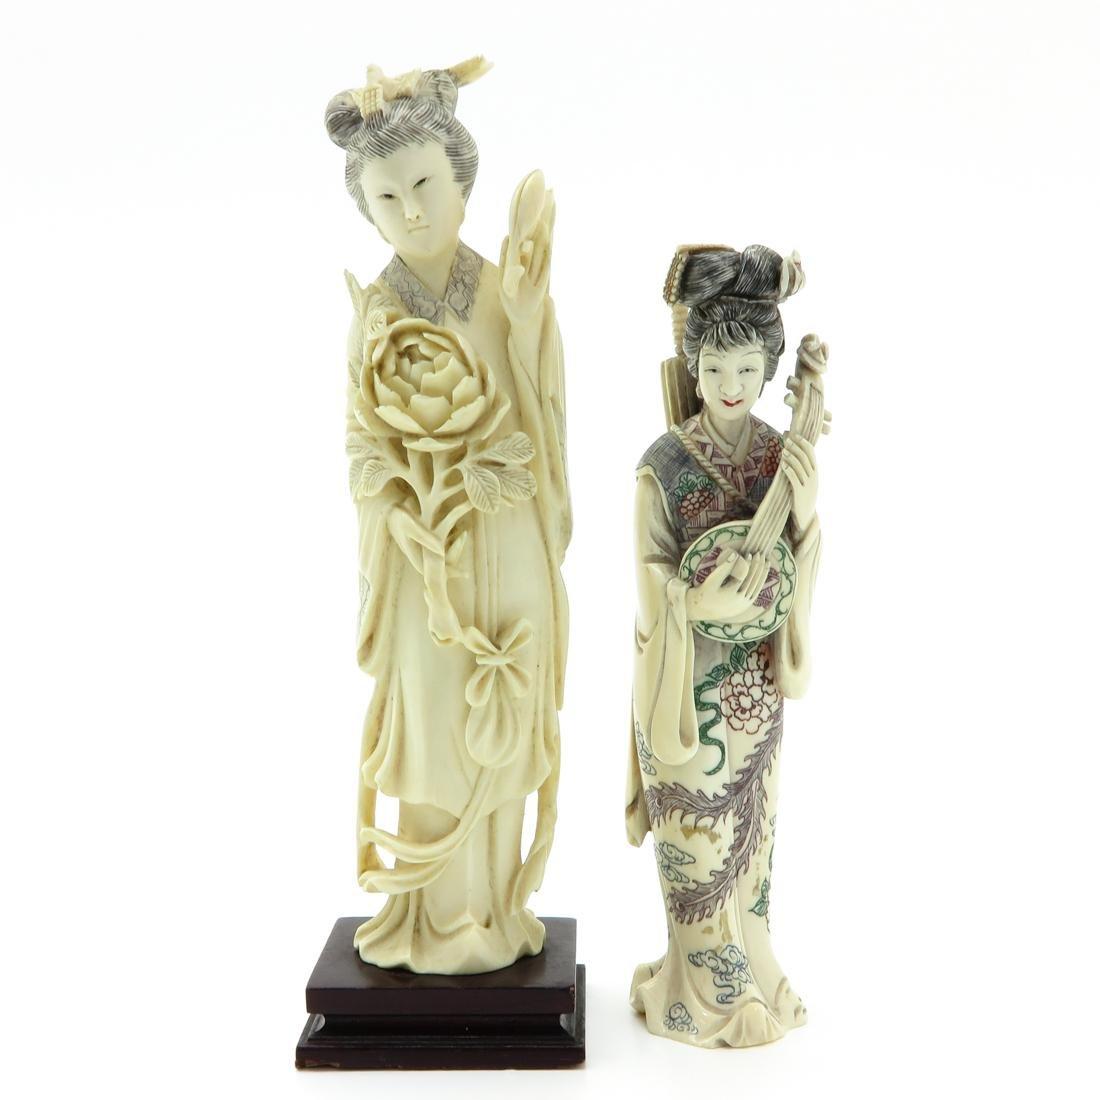 Lot of 2 Carved Sculptures